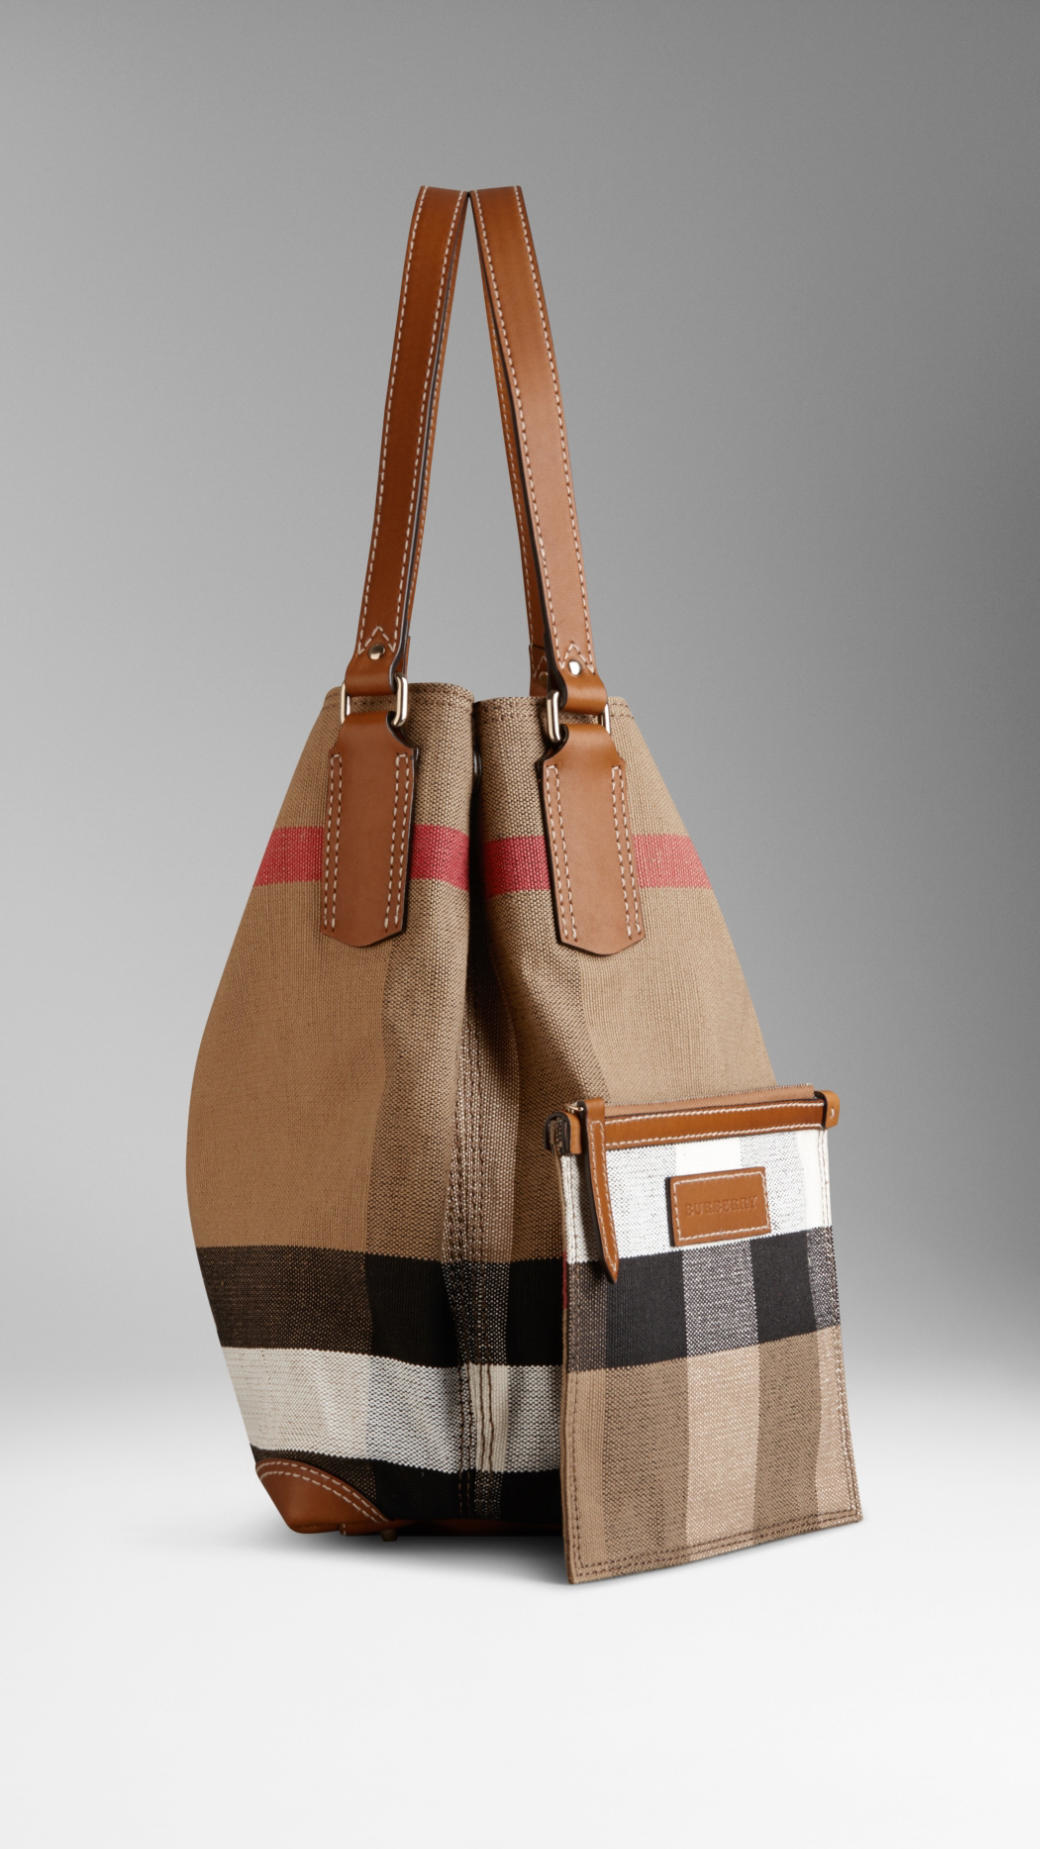 52cf319f535e Lyst - Burberry Medium Canvas Check Tote Bag in Brown